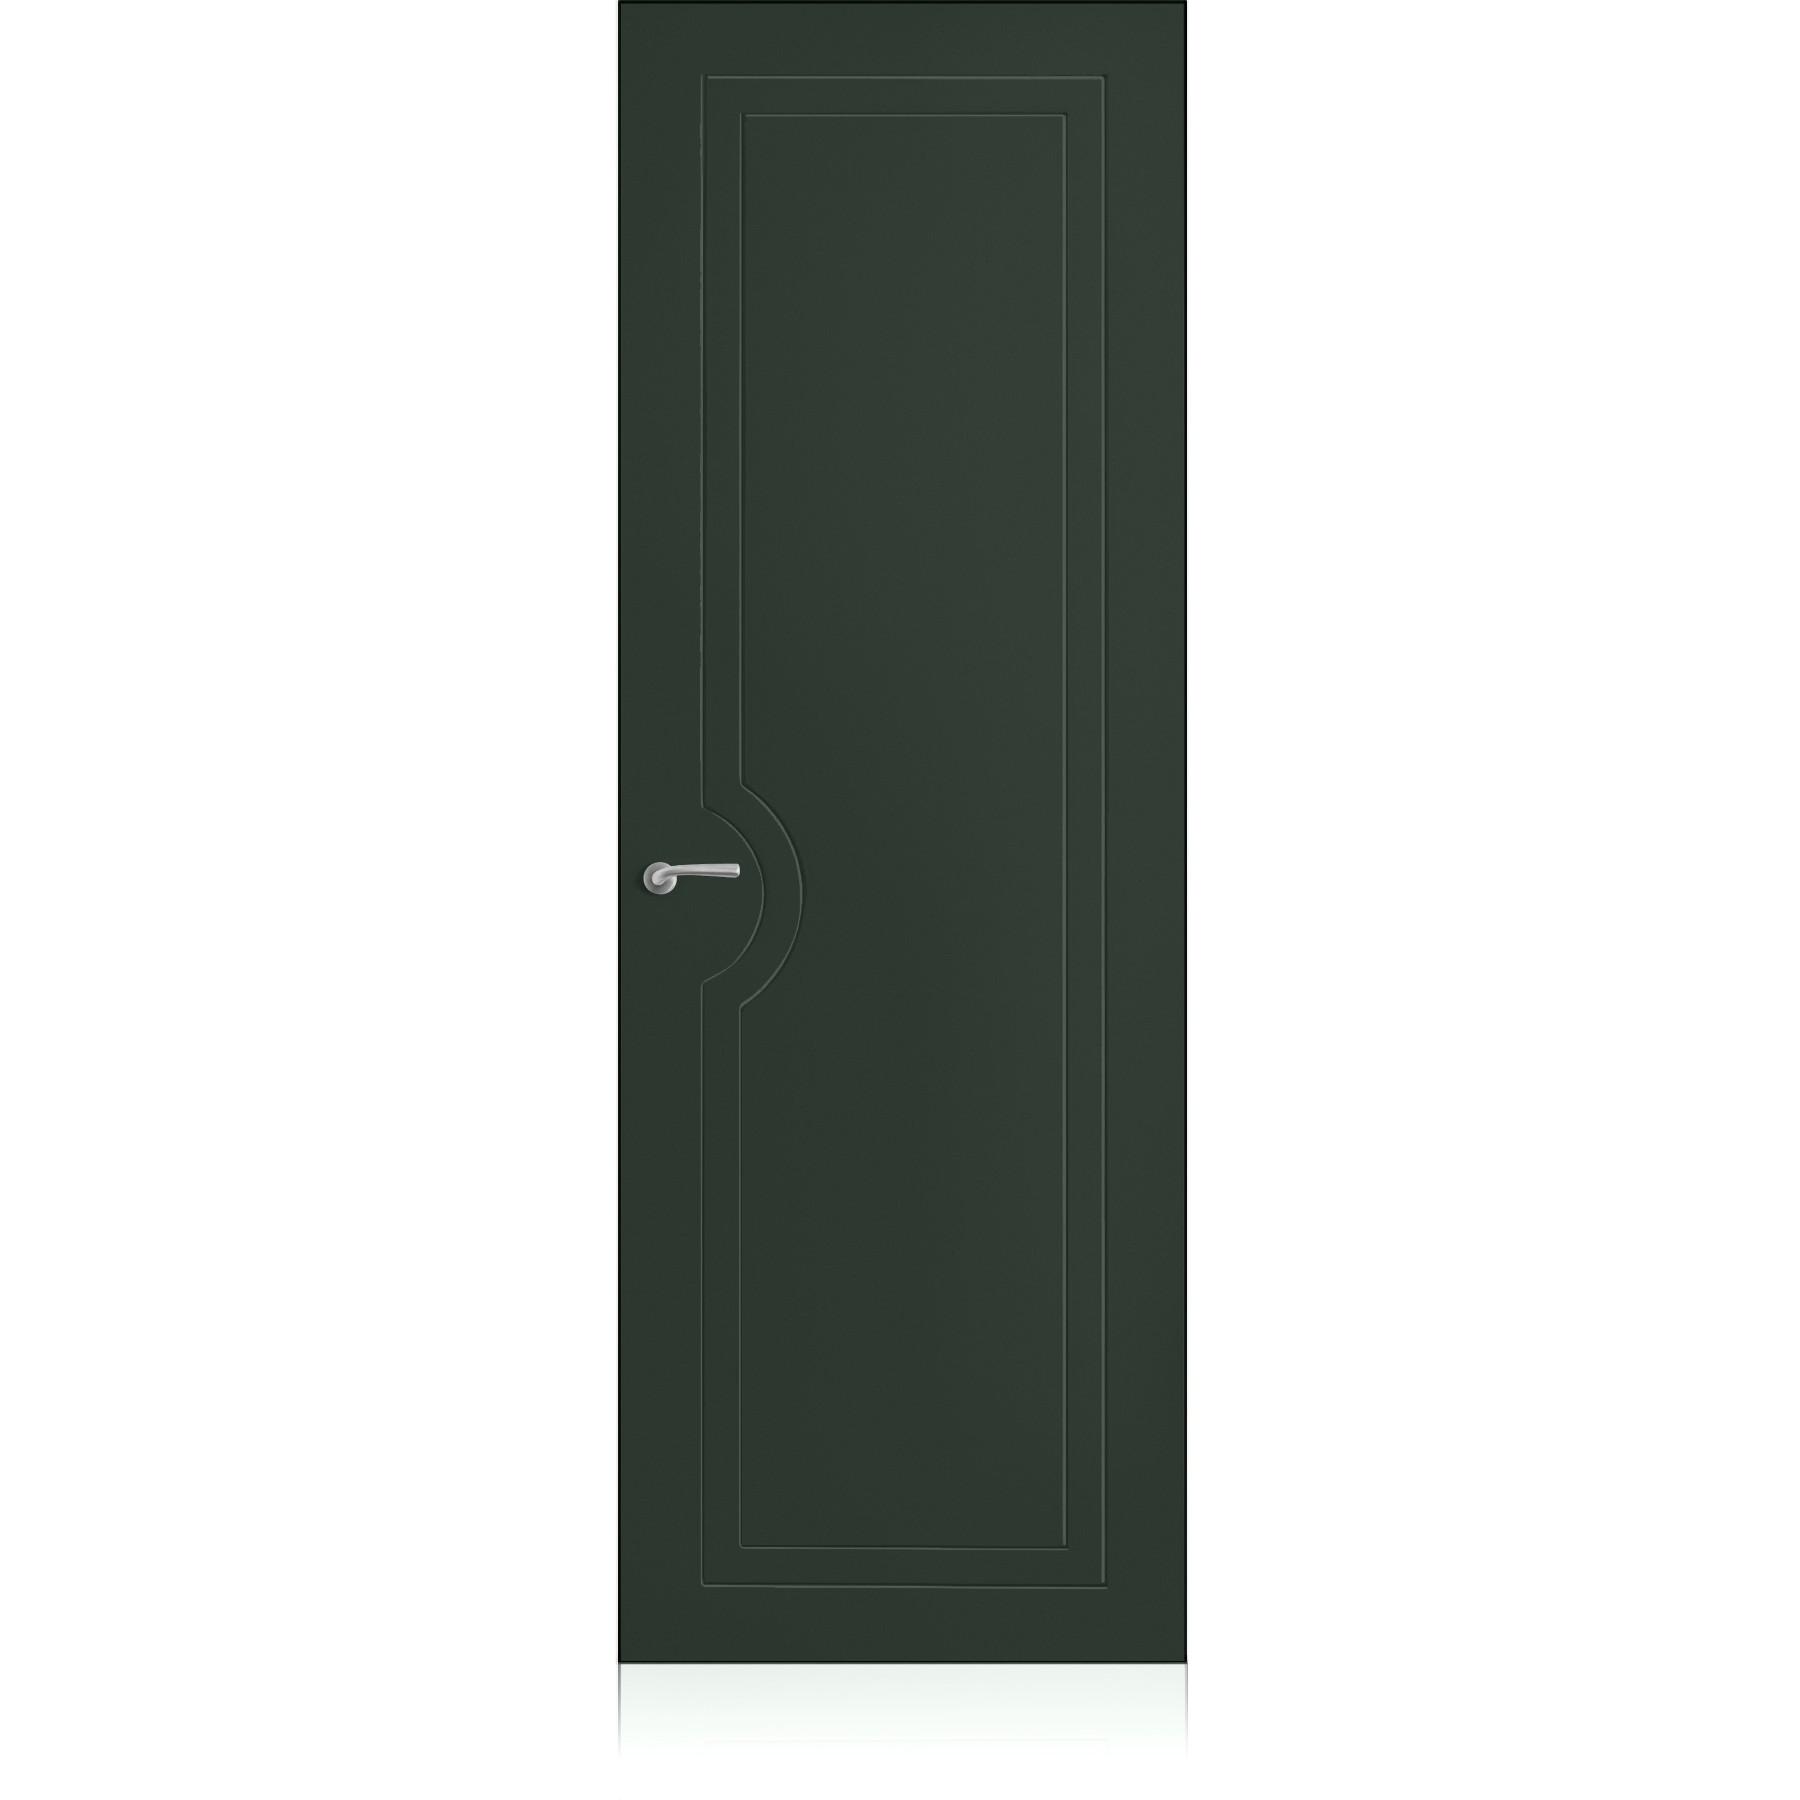 Yncisa/1 Zero Laguna Dark Laccato ULTRAopaco door